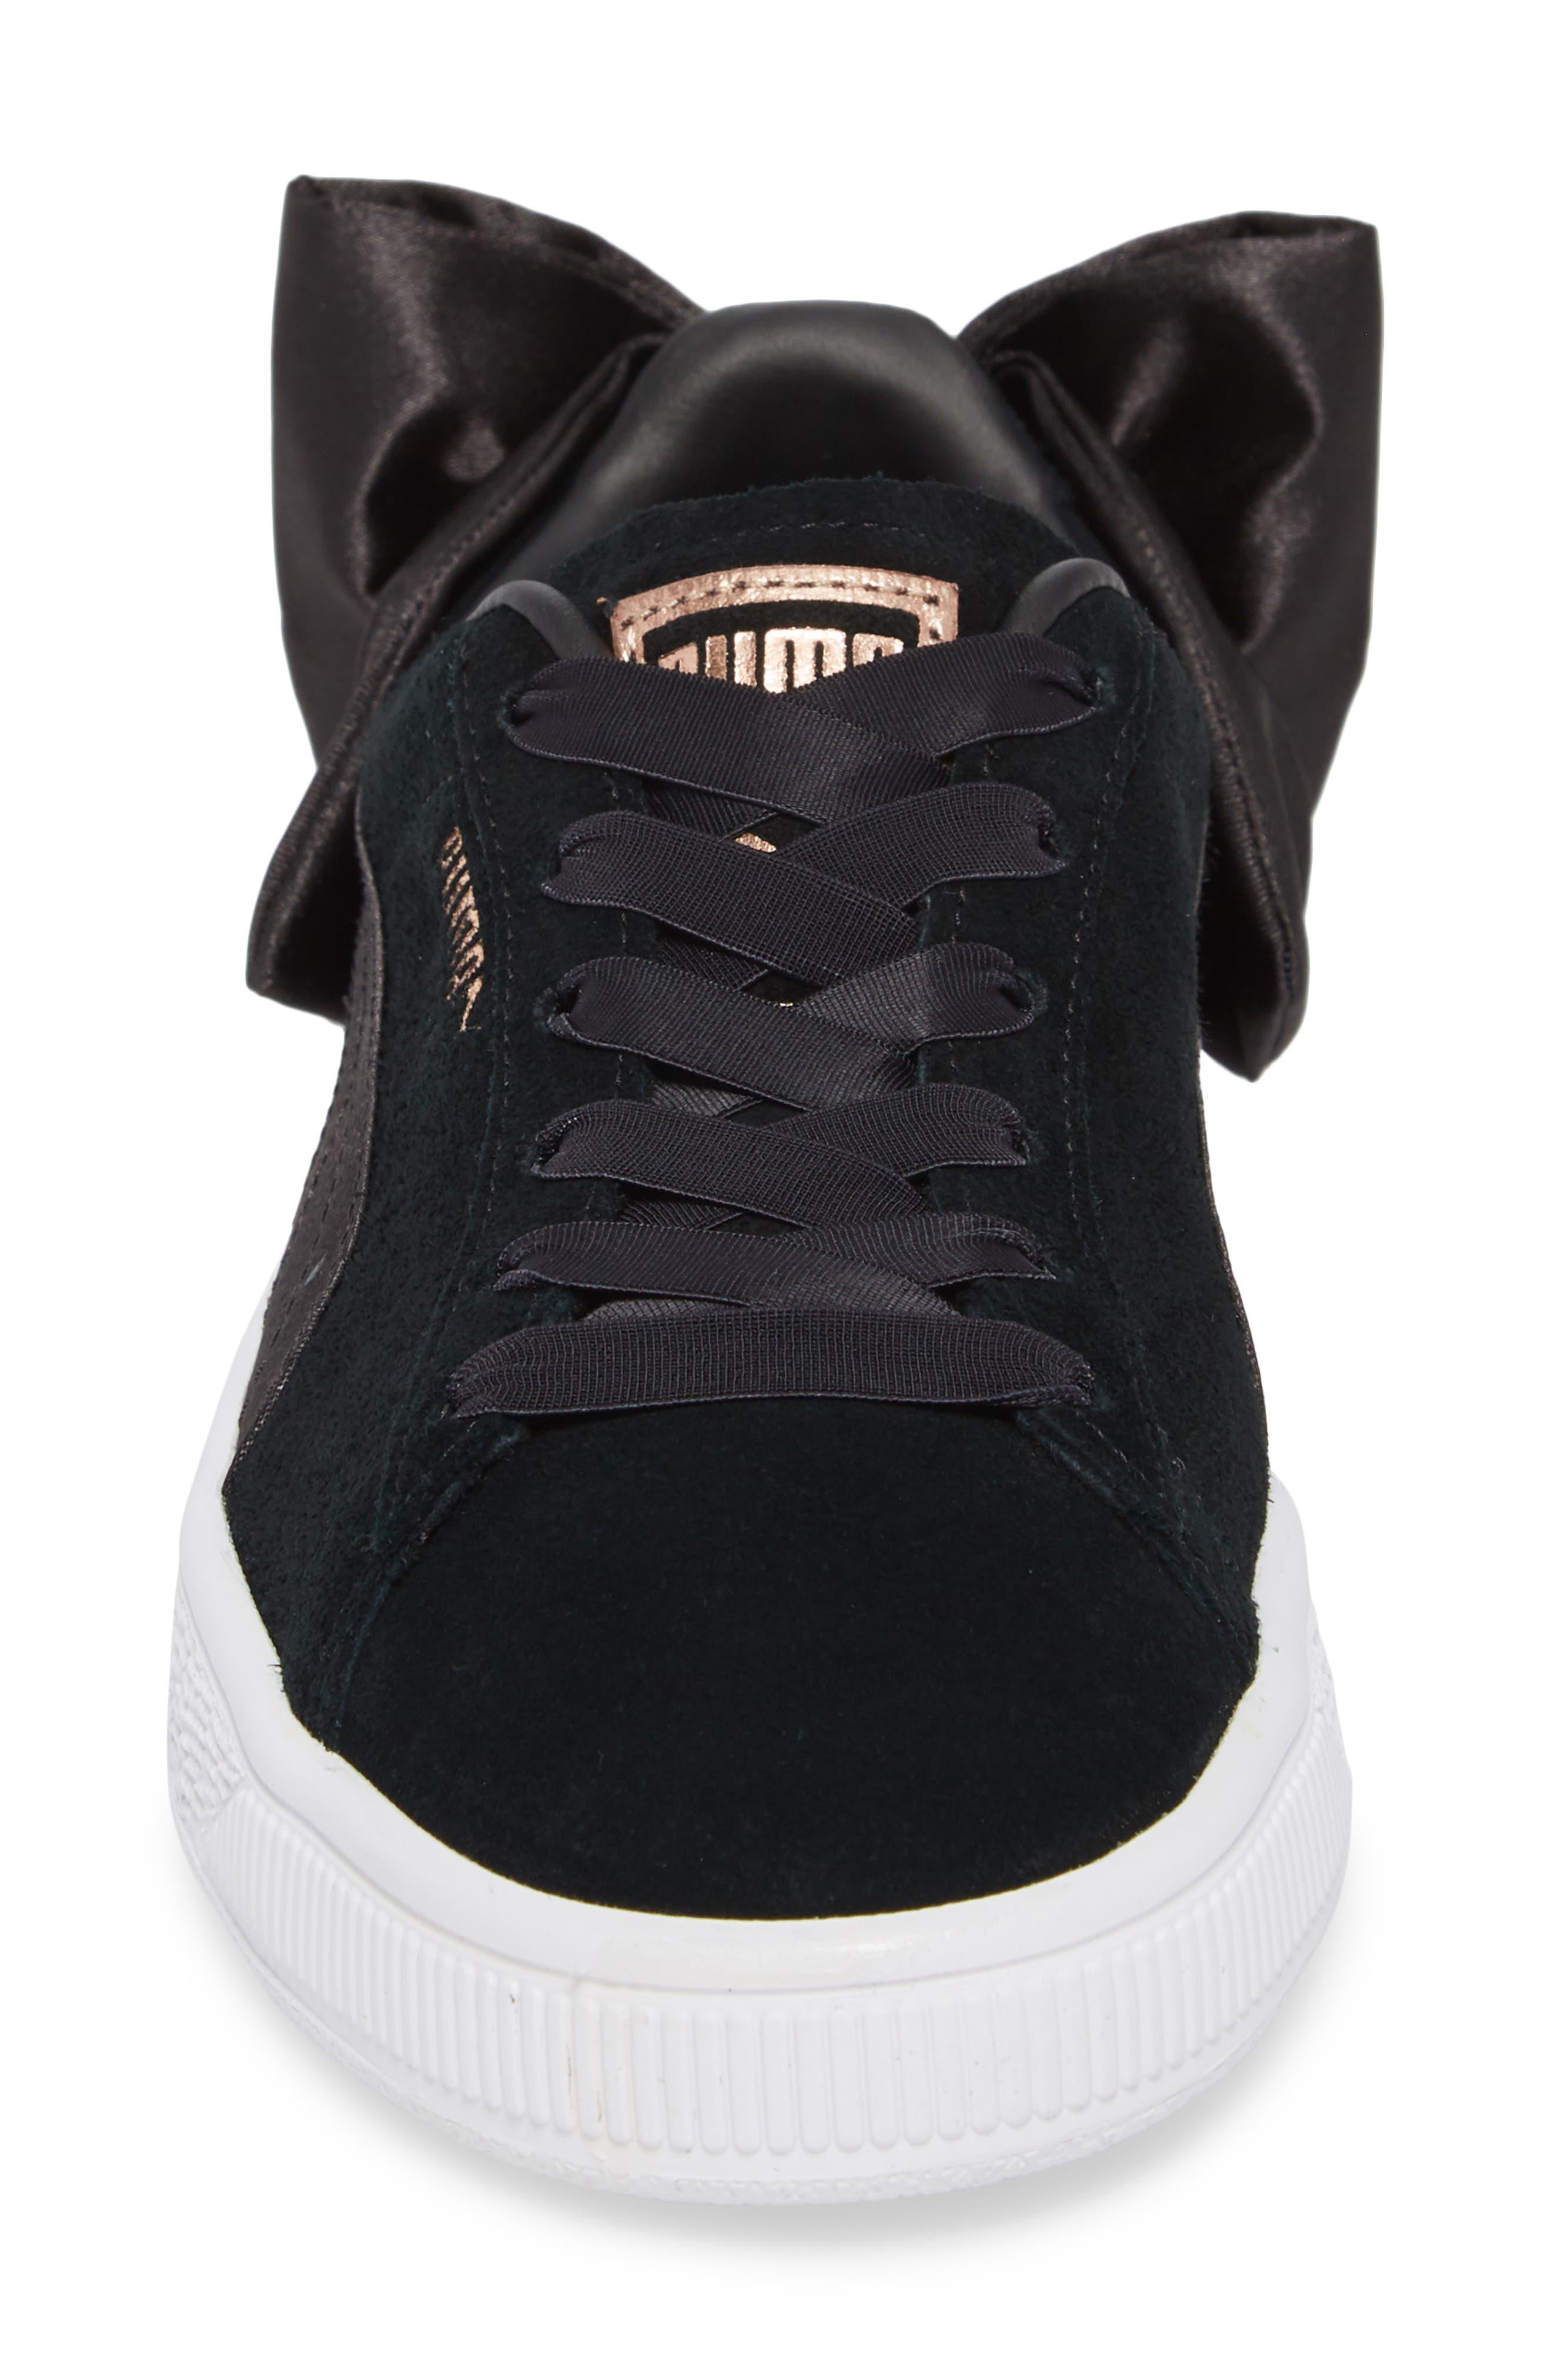 Bow Sneaker,                             Alternate thumbnail 4, color,                             Black/ Black